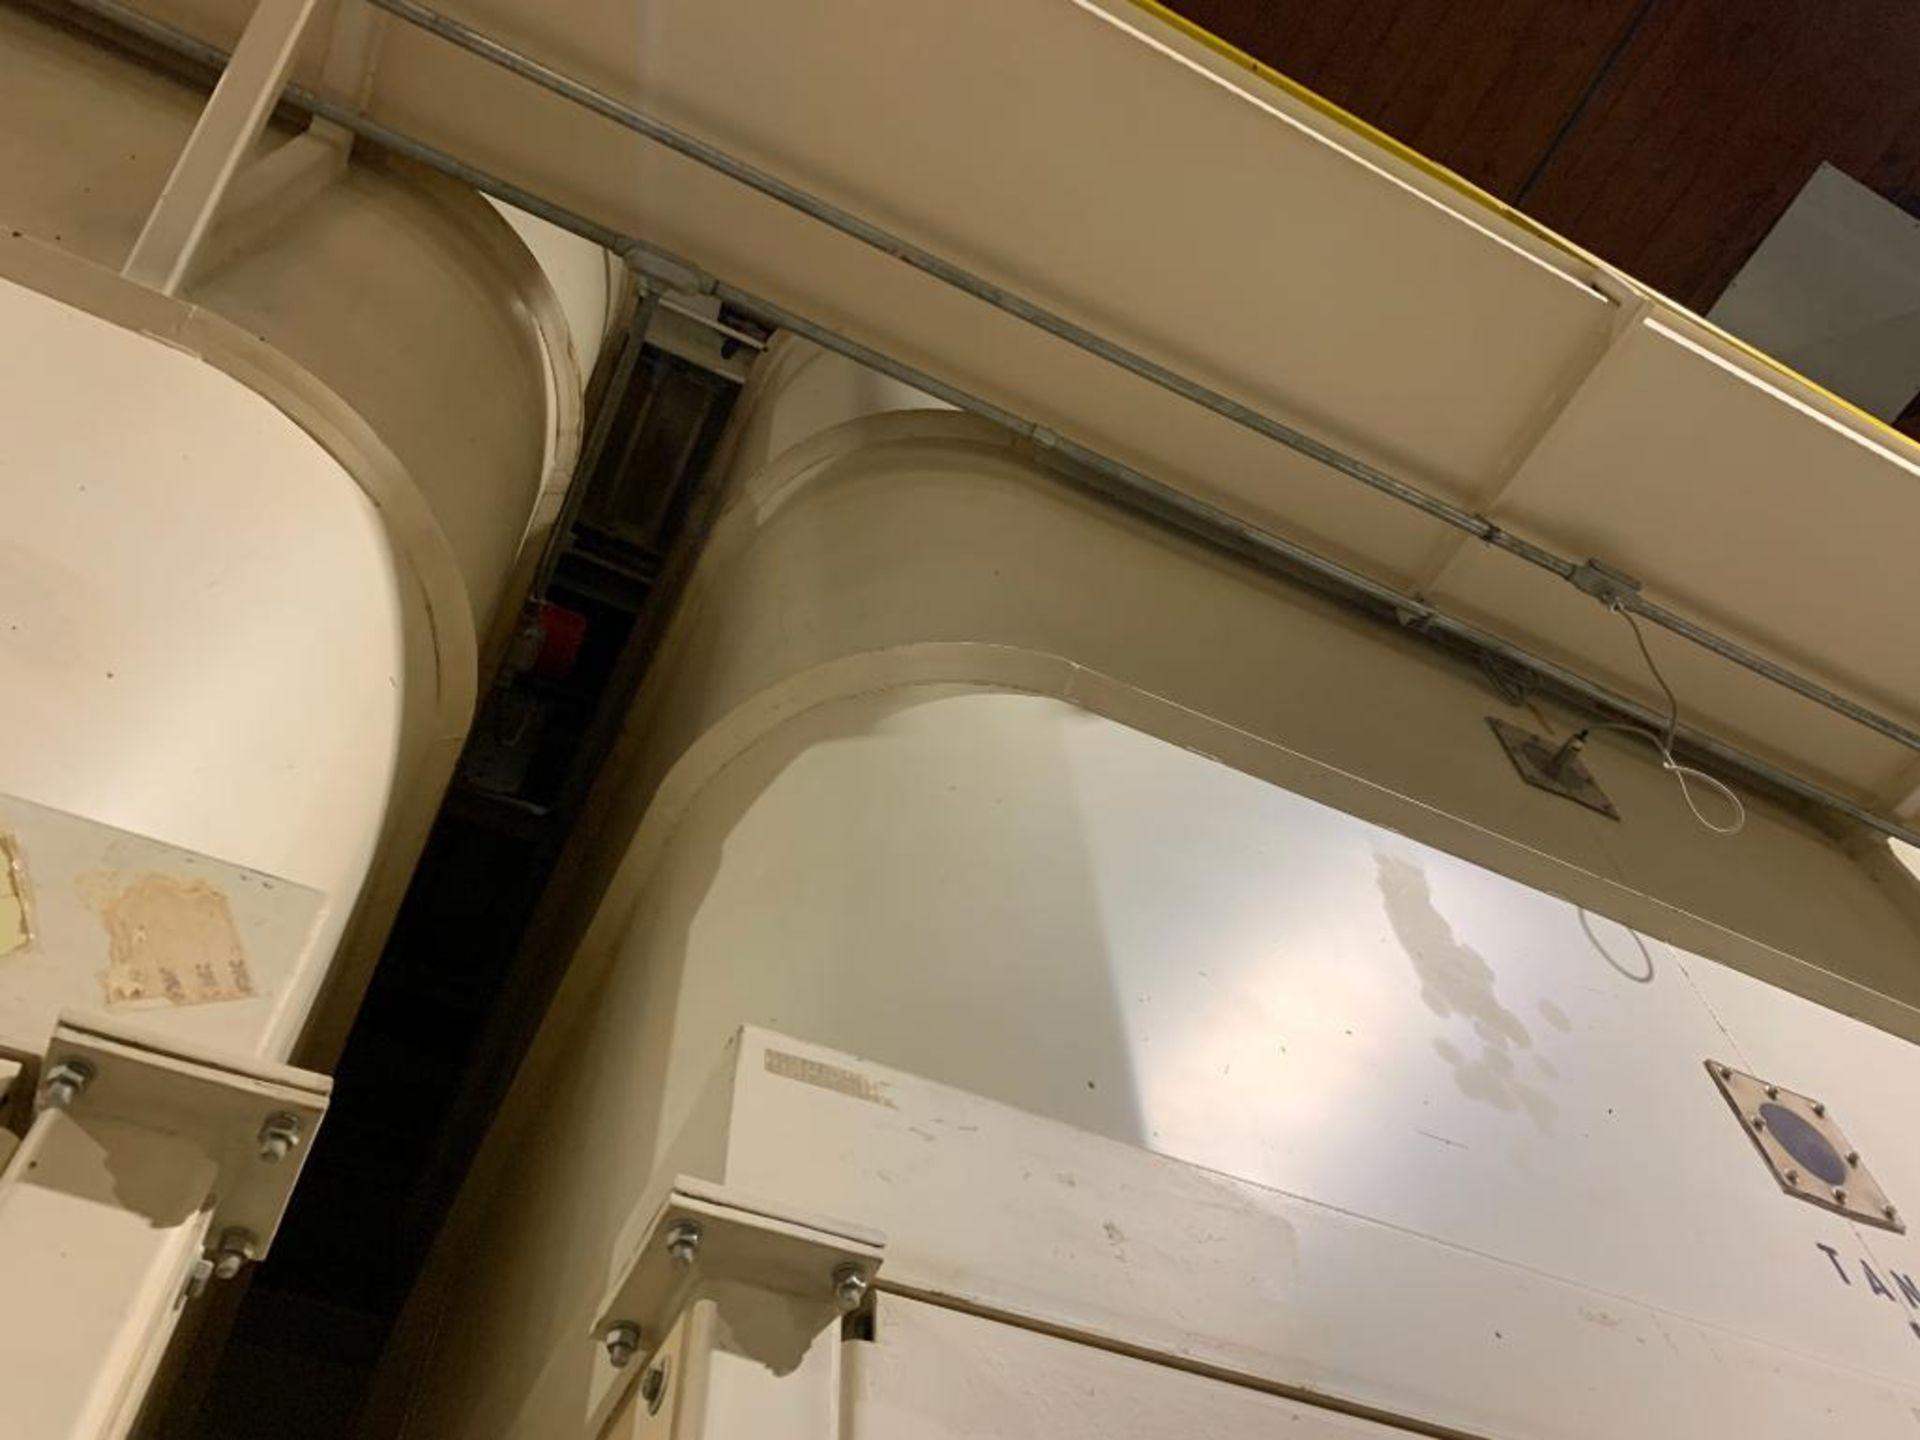 Aseeco mild steel cone bottom bulk storage bin - Image 14 of 19